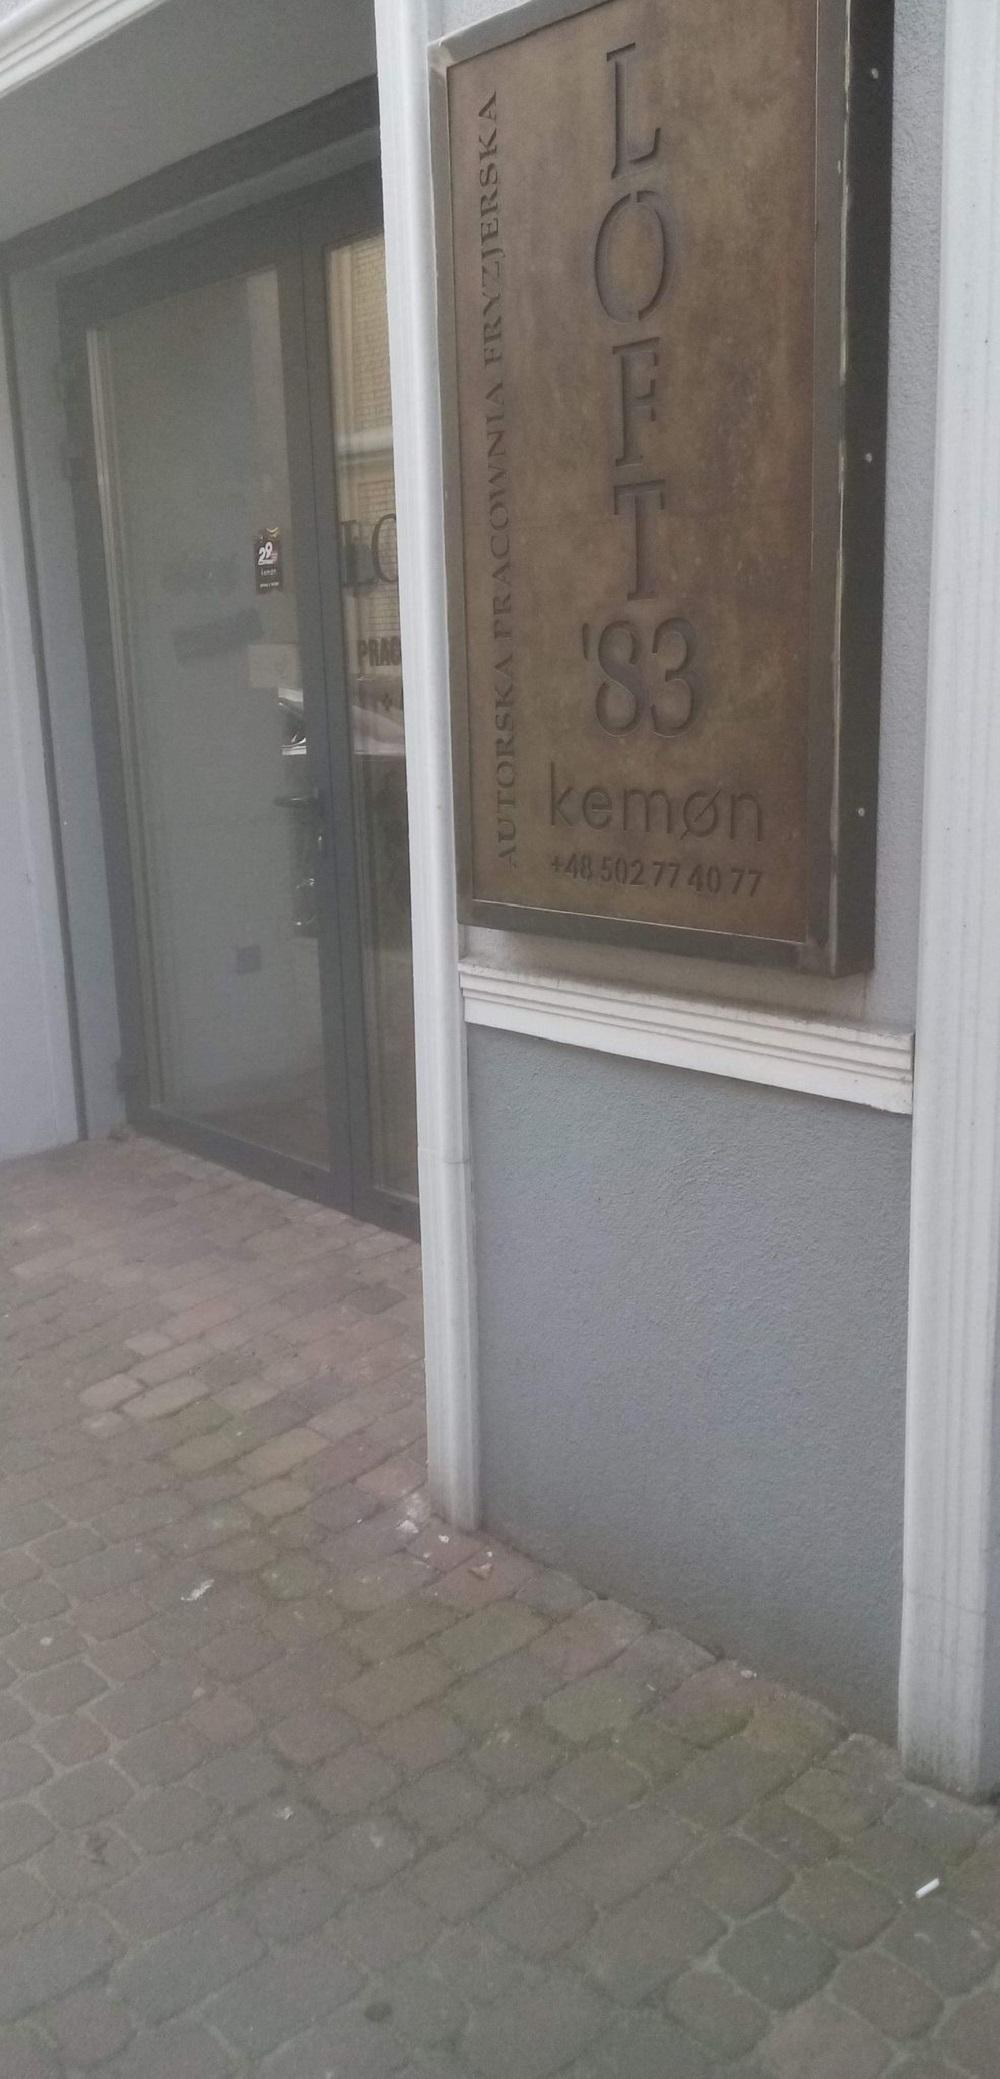 Loft'83 Pracownia fryzjerska